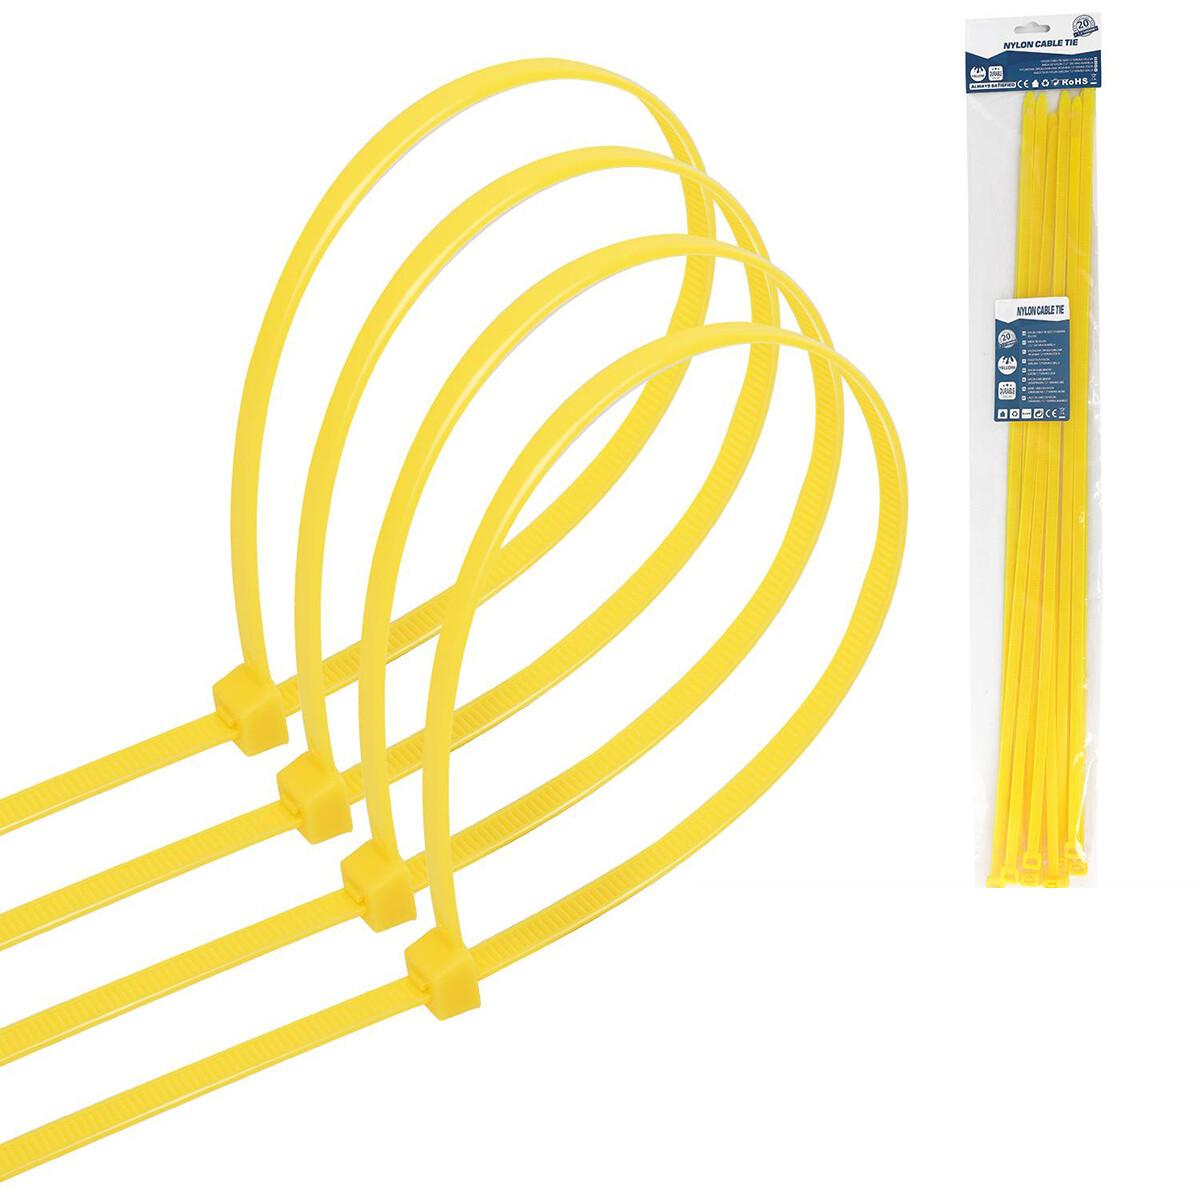 Tie Wraps - Tyrap - Aigi Tie - 7.2x500mm - Geel - 20 Stuks